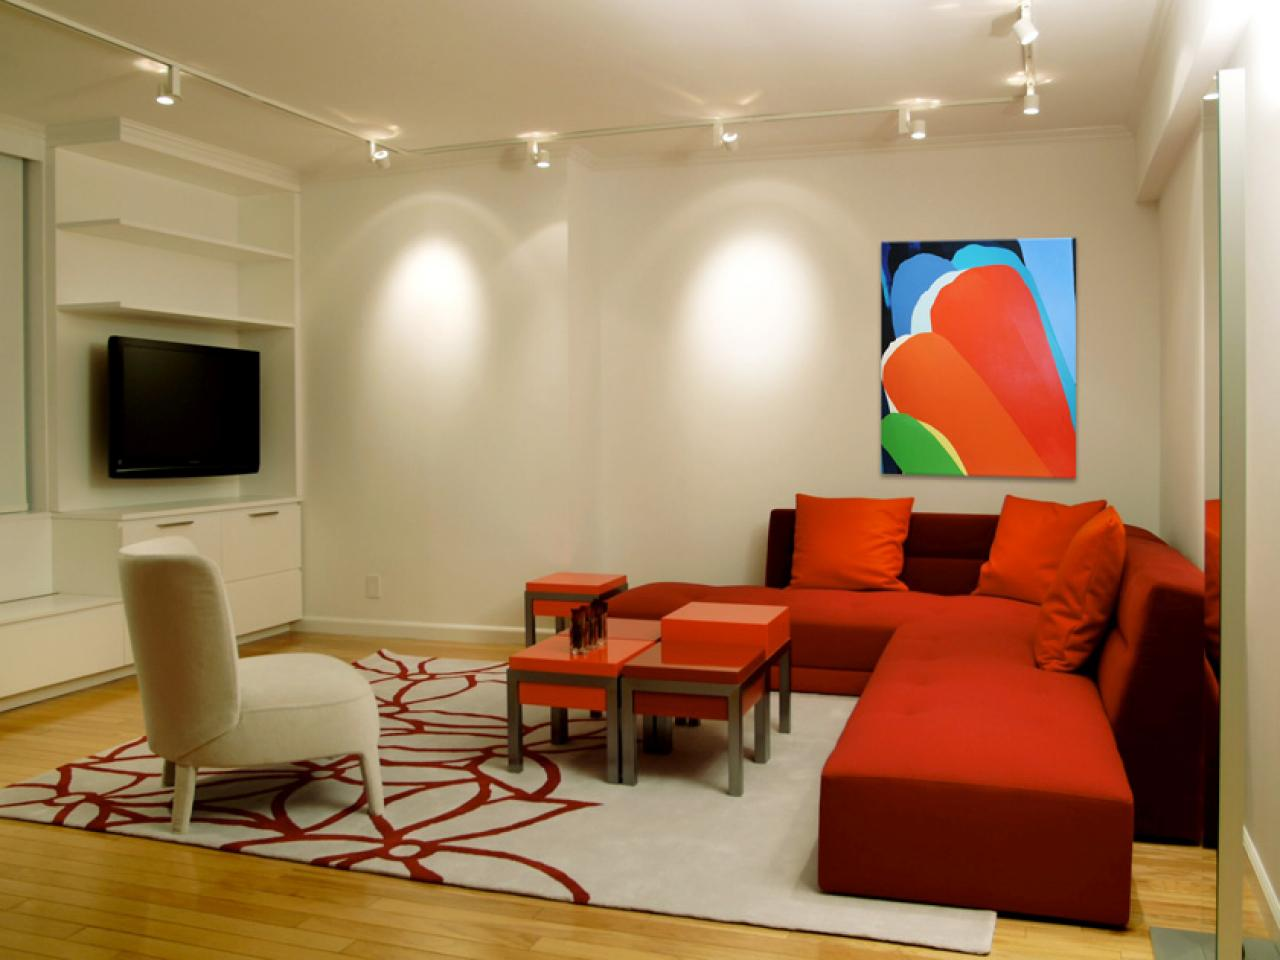 DP_Berliner-red-modern-living-room_s4x3